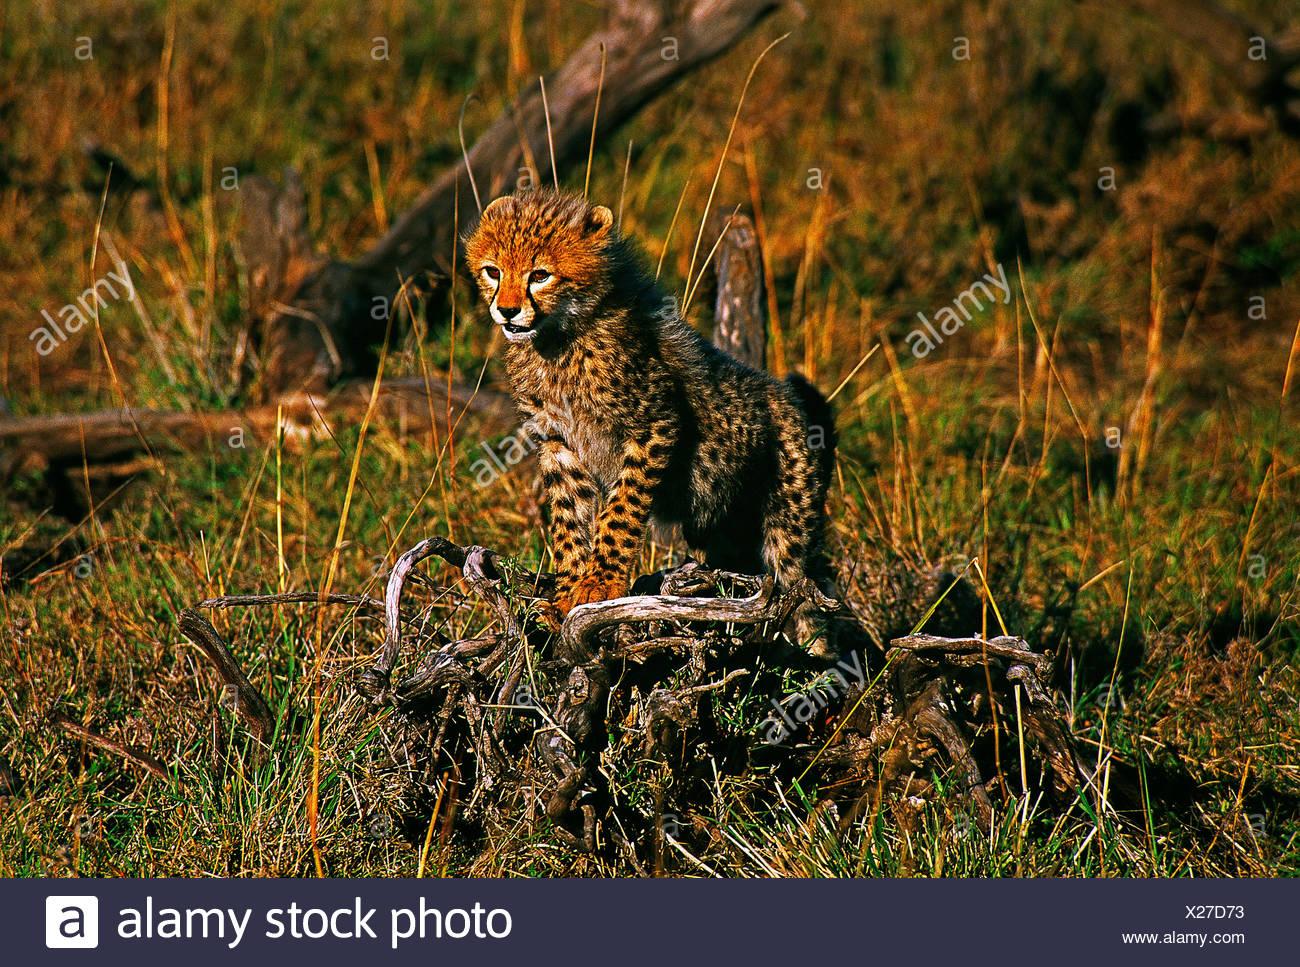 África kenya. MAASAI MARA reserva nacional de fauna y flora.cheetah cub. Imagen De Stock